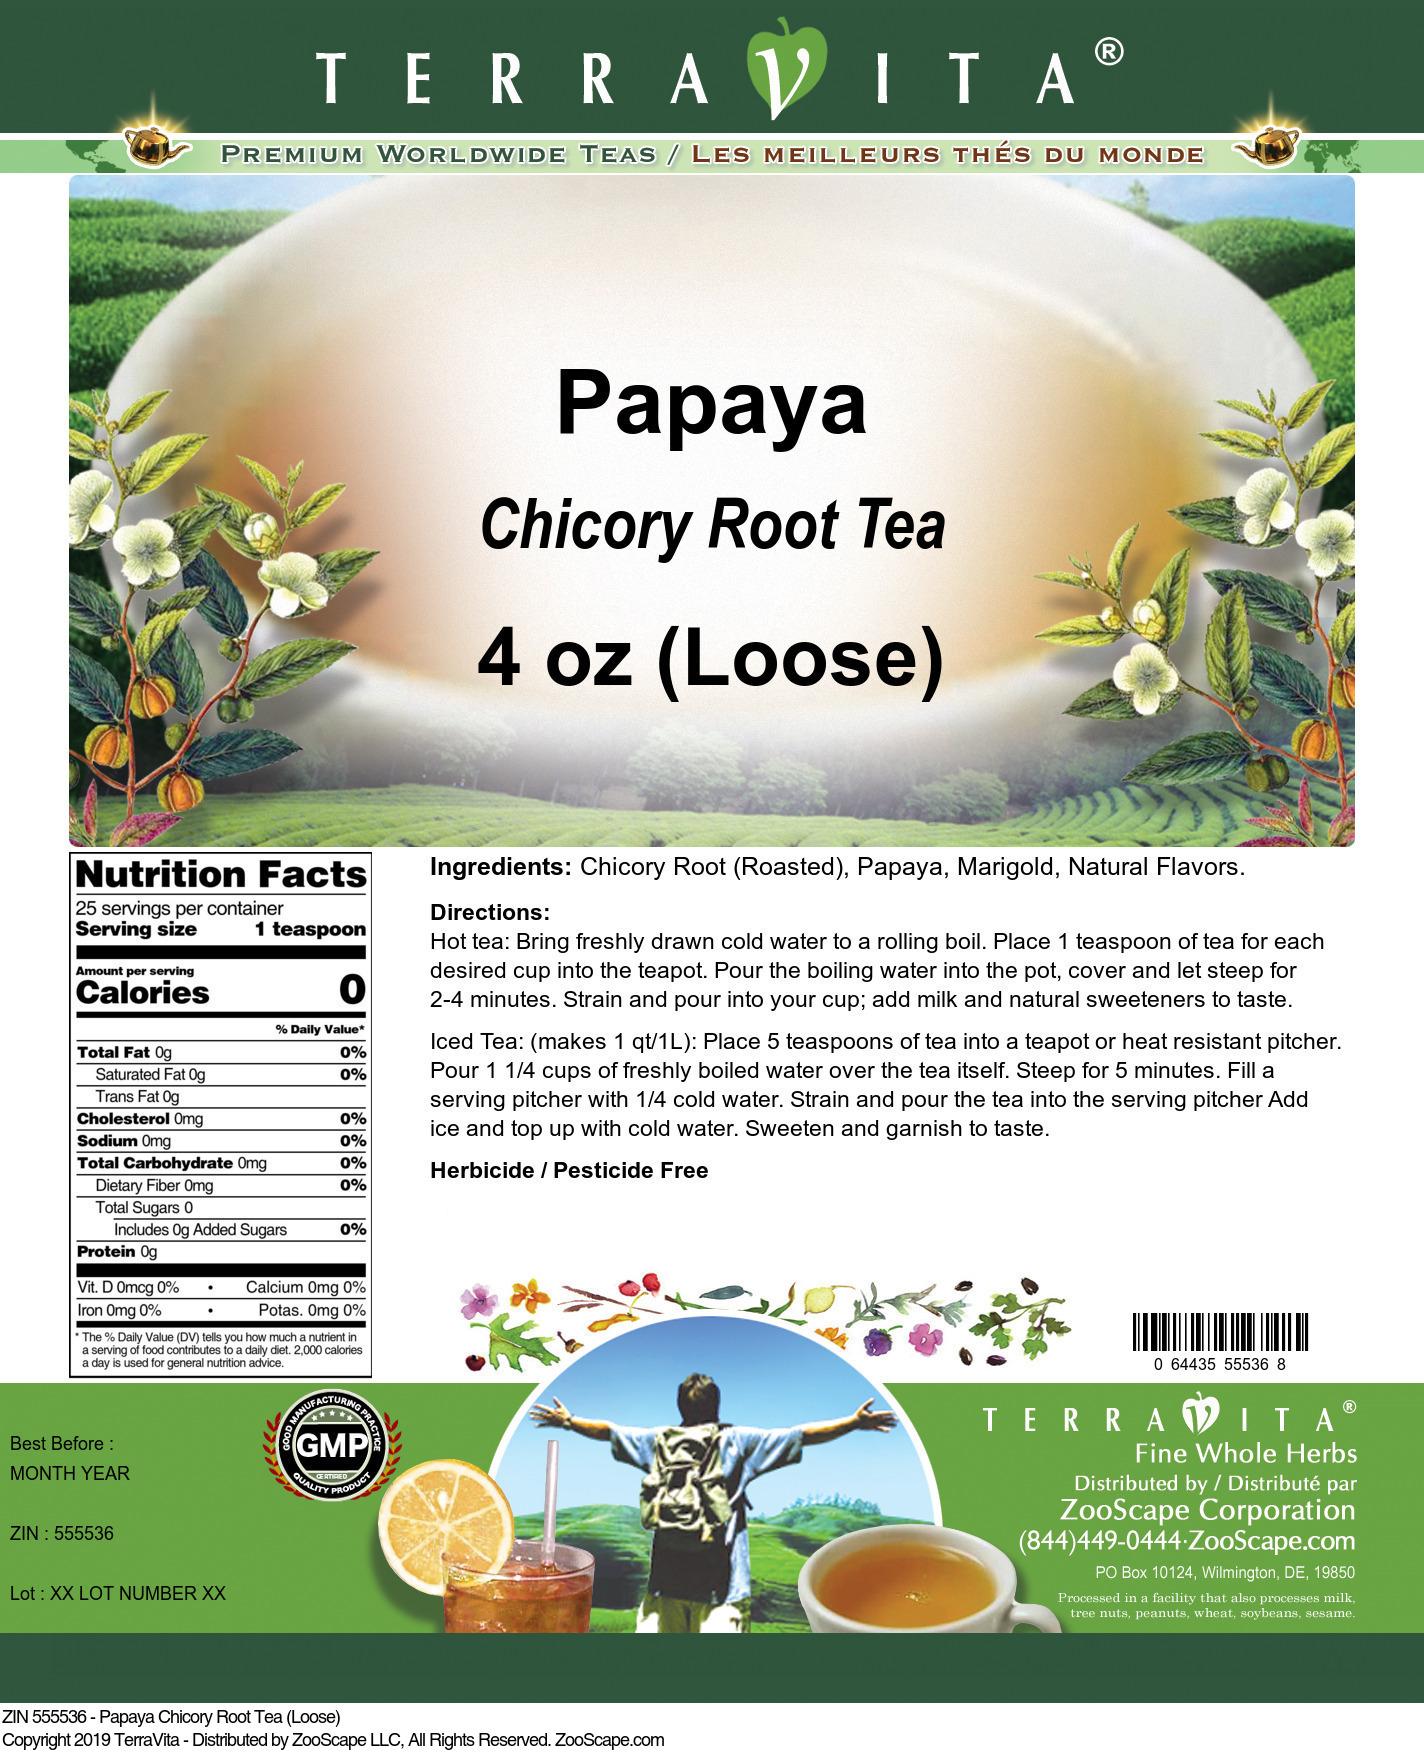 Papaya Chicory Root Tea (Loose)